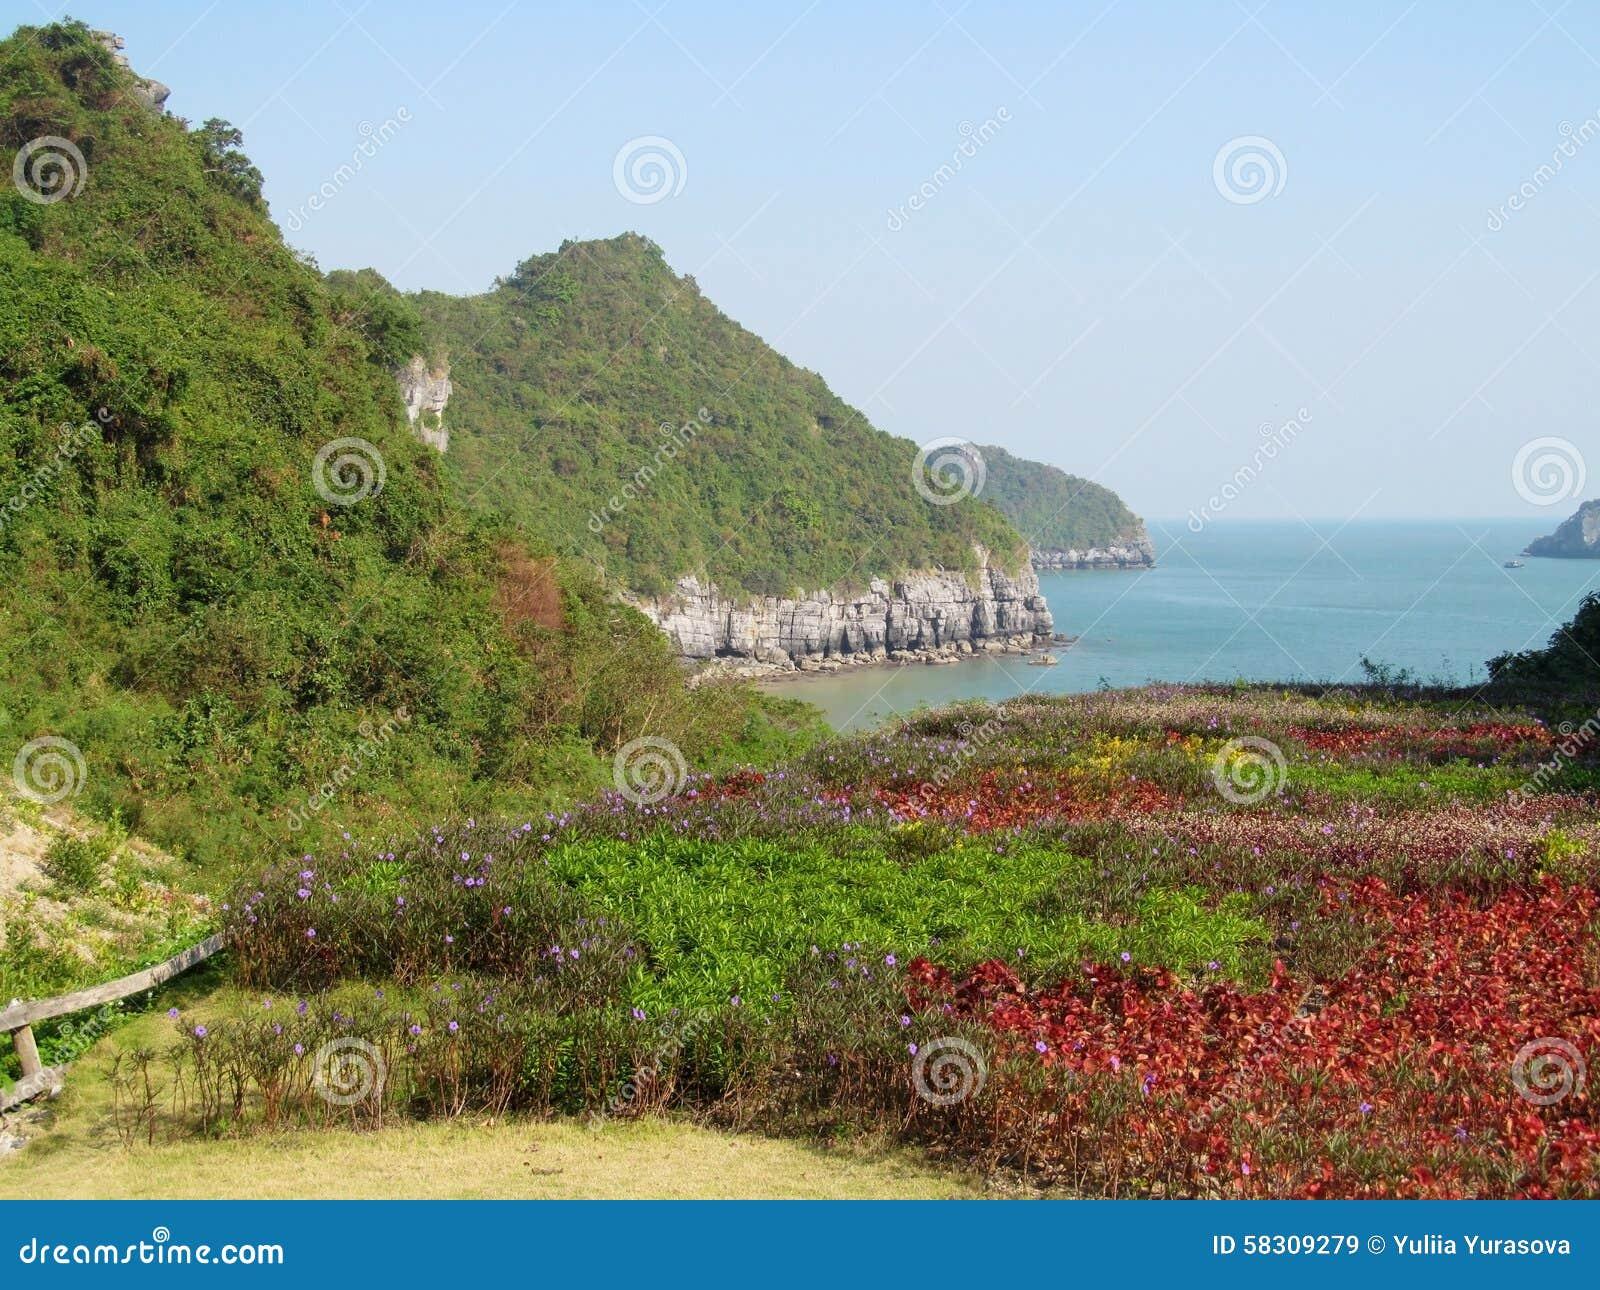 Scenic islands in the sea of of Ha Long Bay, Vietnam